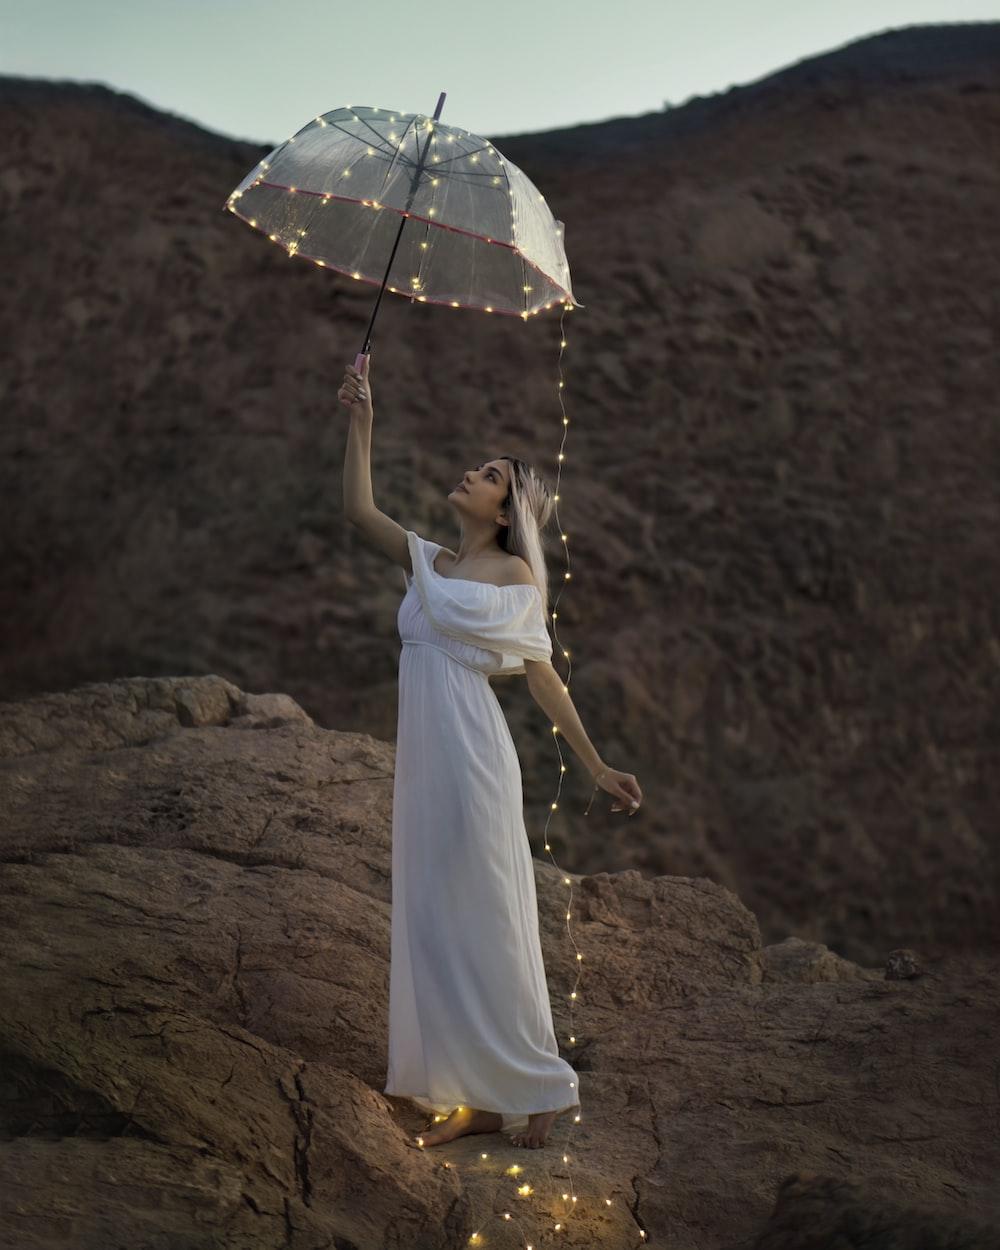 woman in white dress holding umbrella